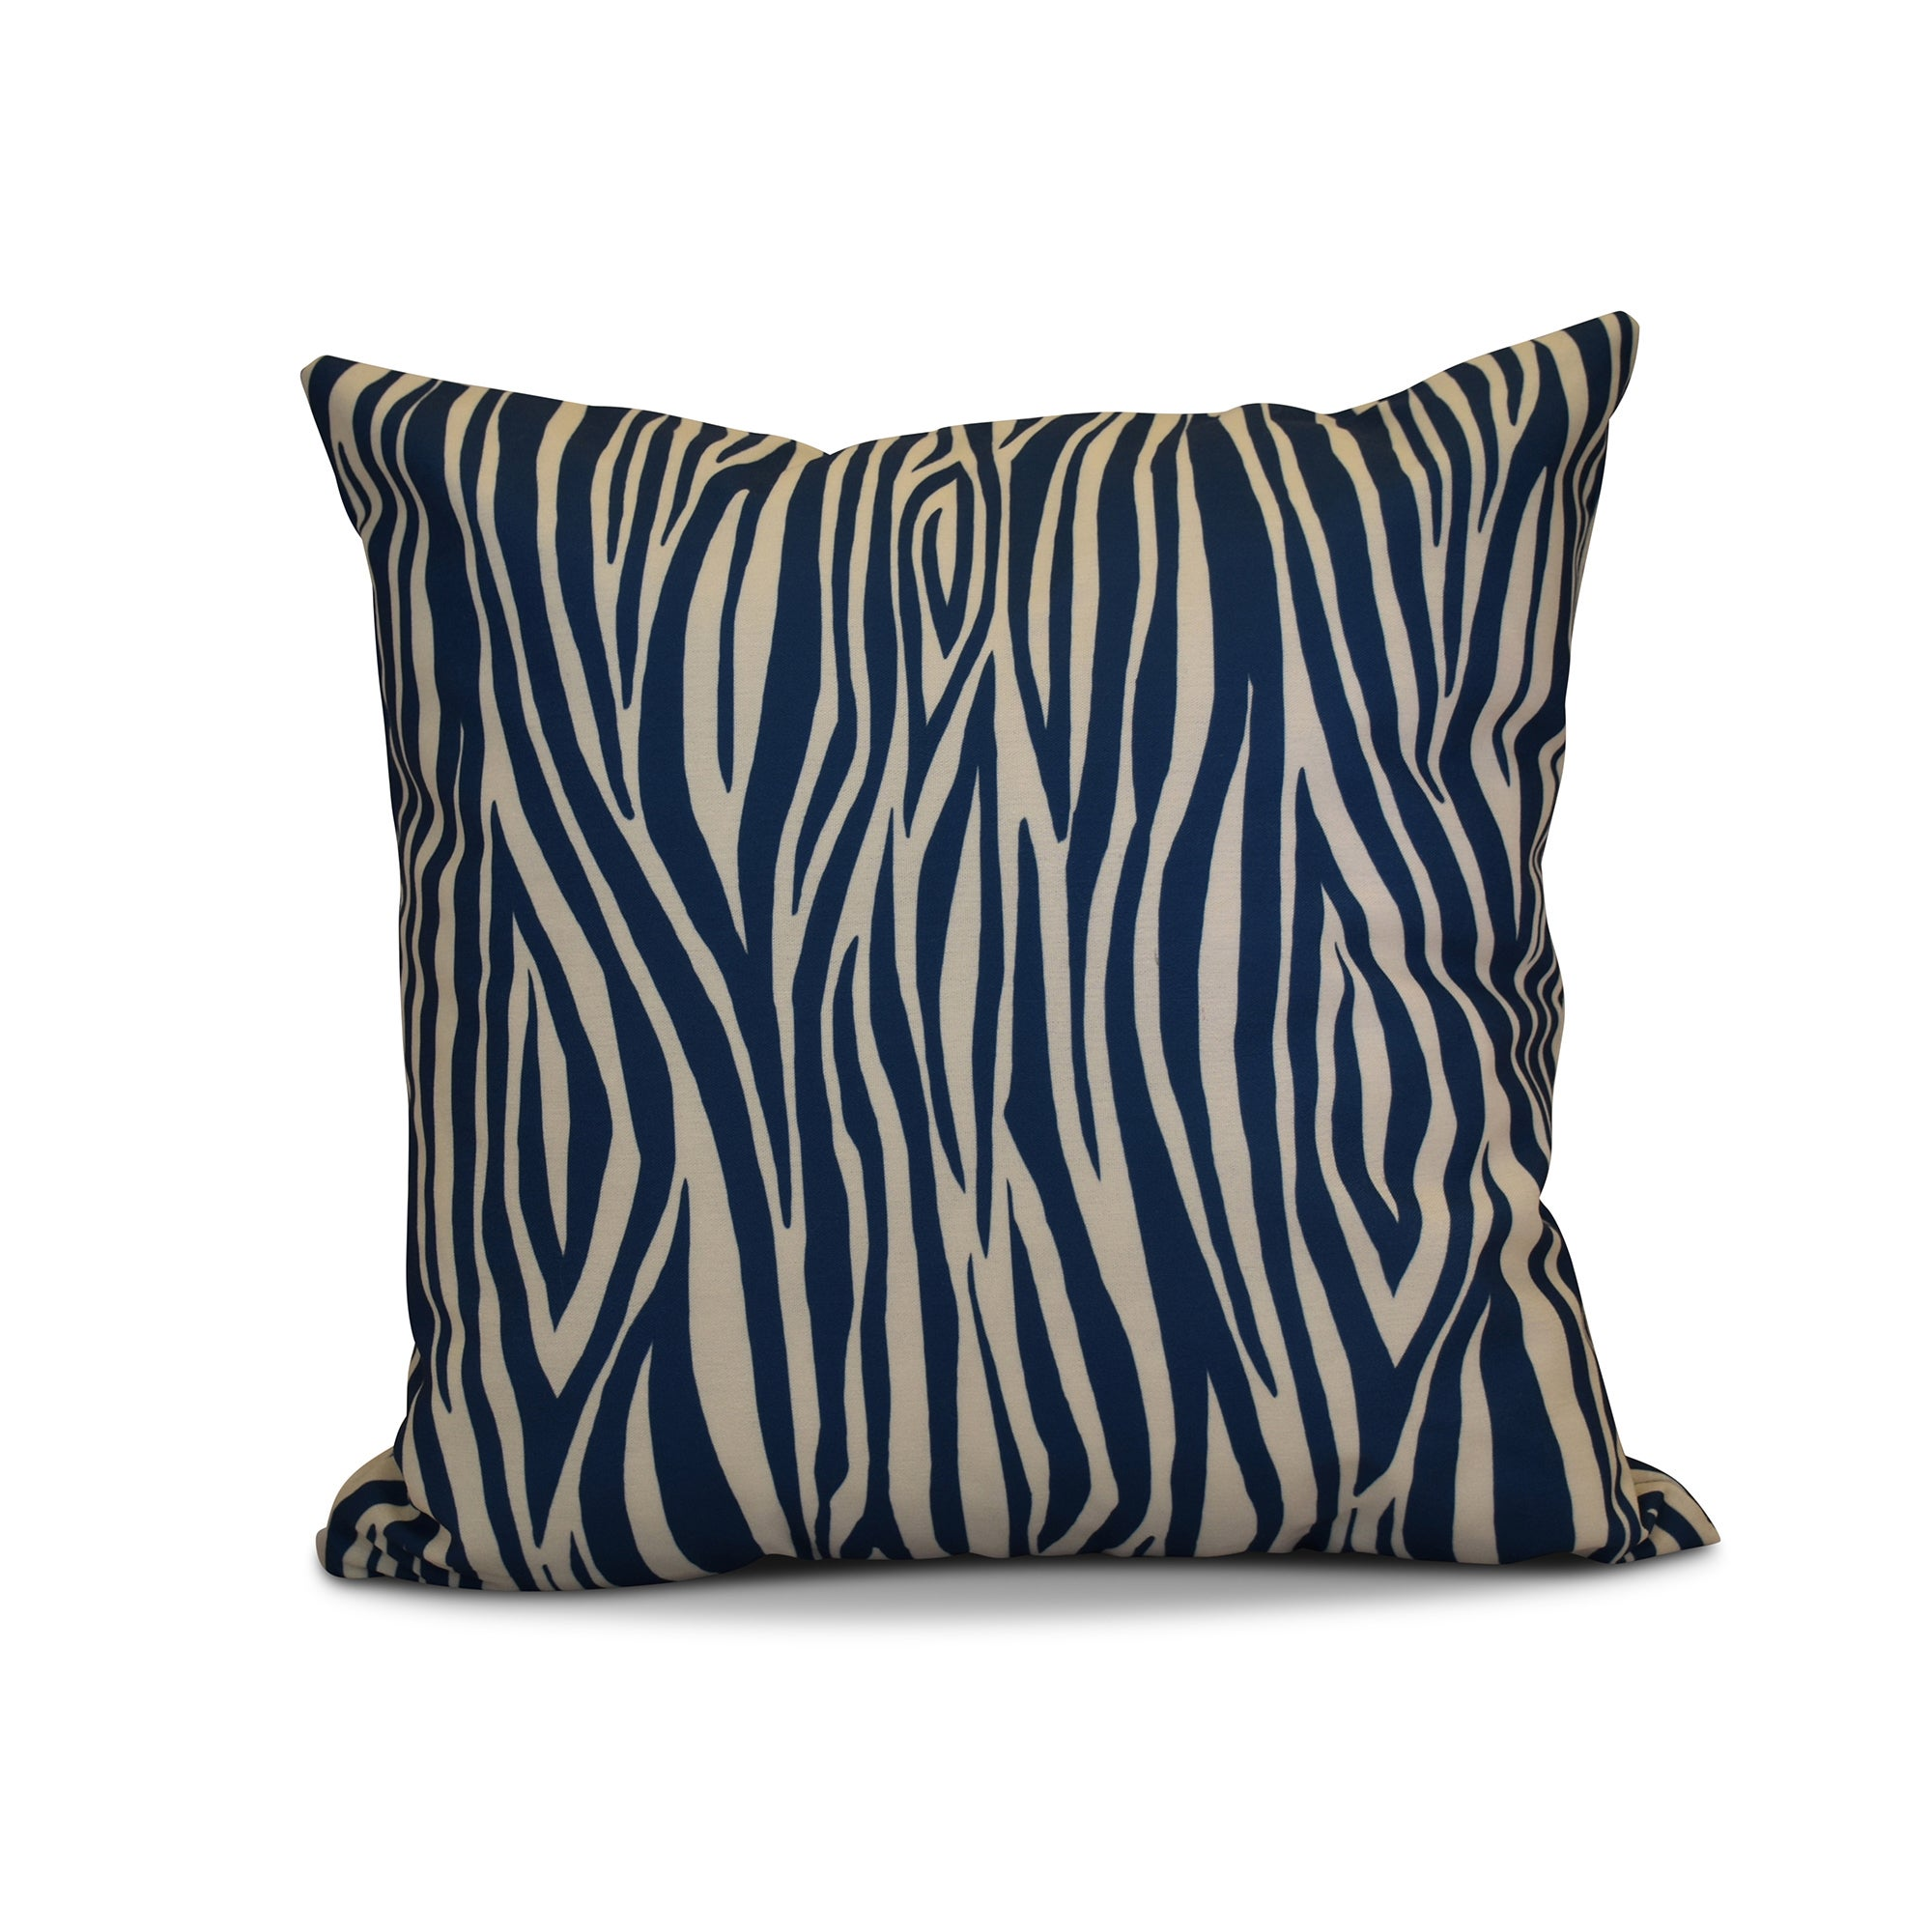 20 x 20-inch Wood Stripe Geometric Print Pillow (Jade)